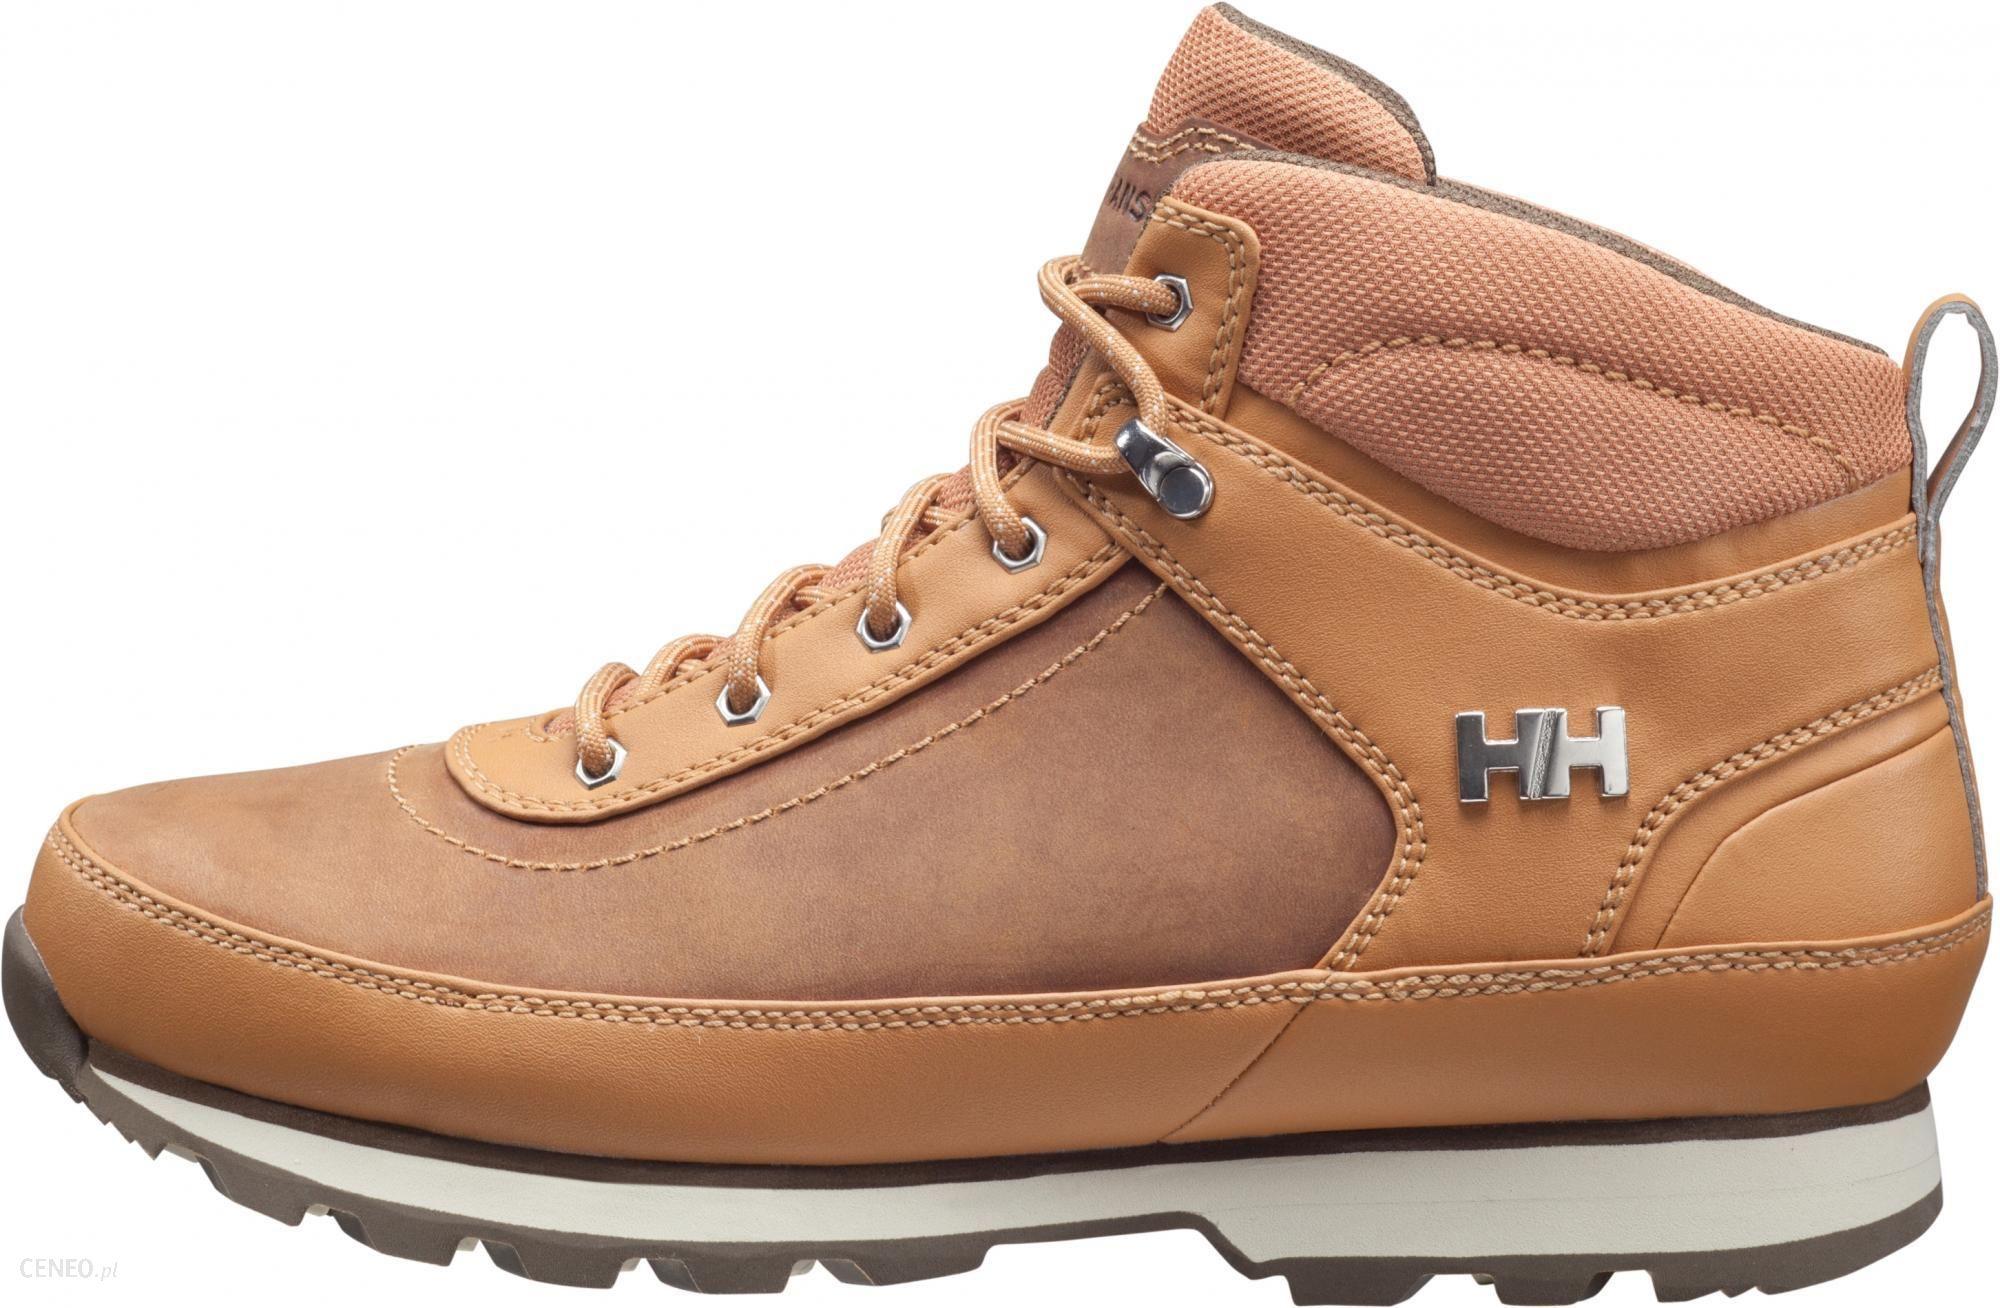 748f6a6f Helly Hansen buty zimowe Calgary Honey Wheat/Natura/Wa EU 41/US 8 ...